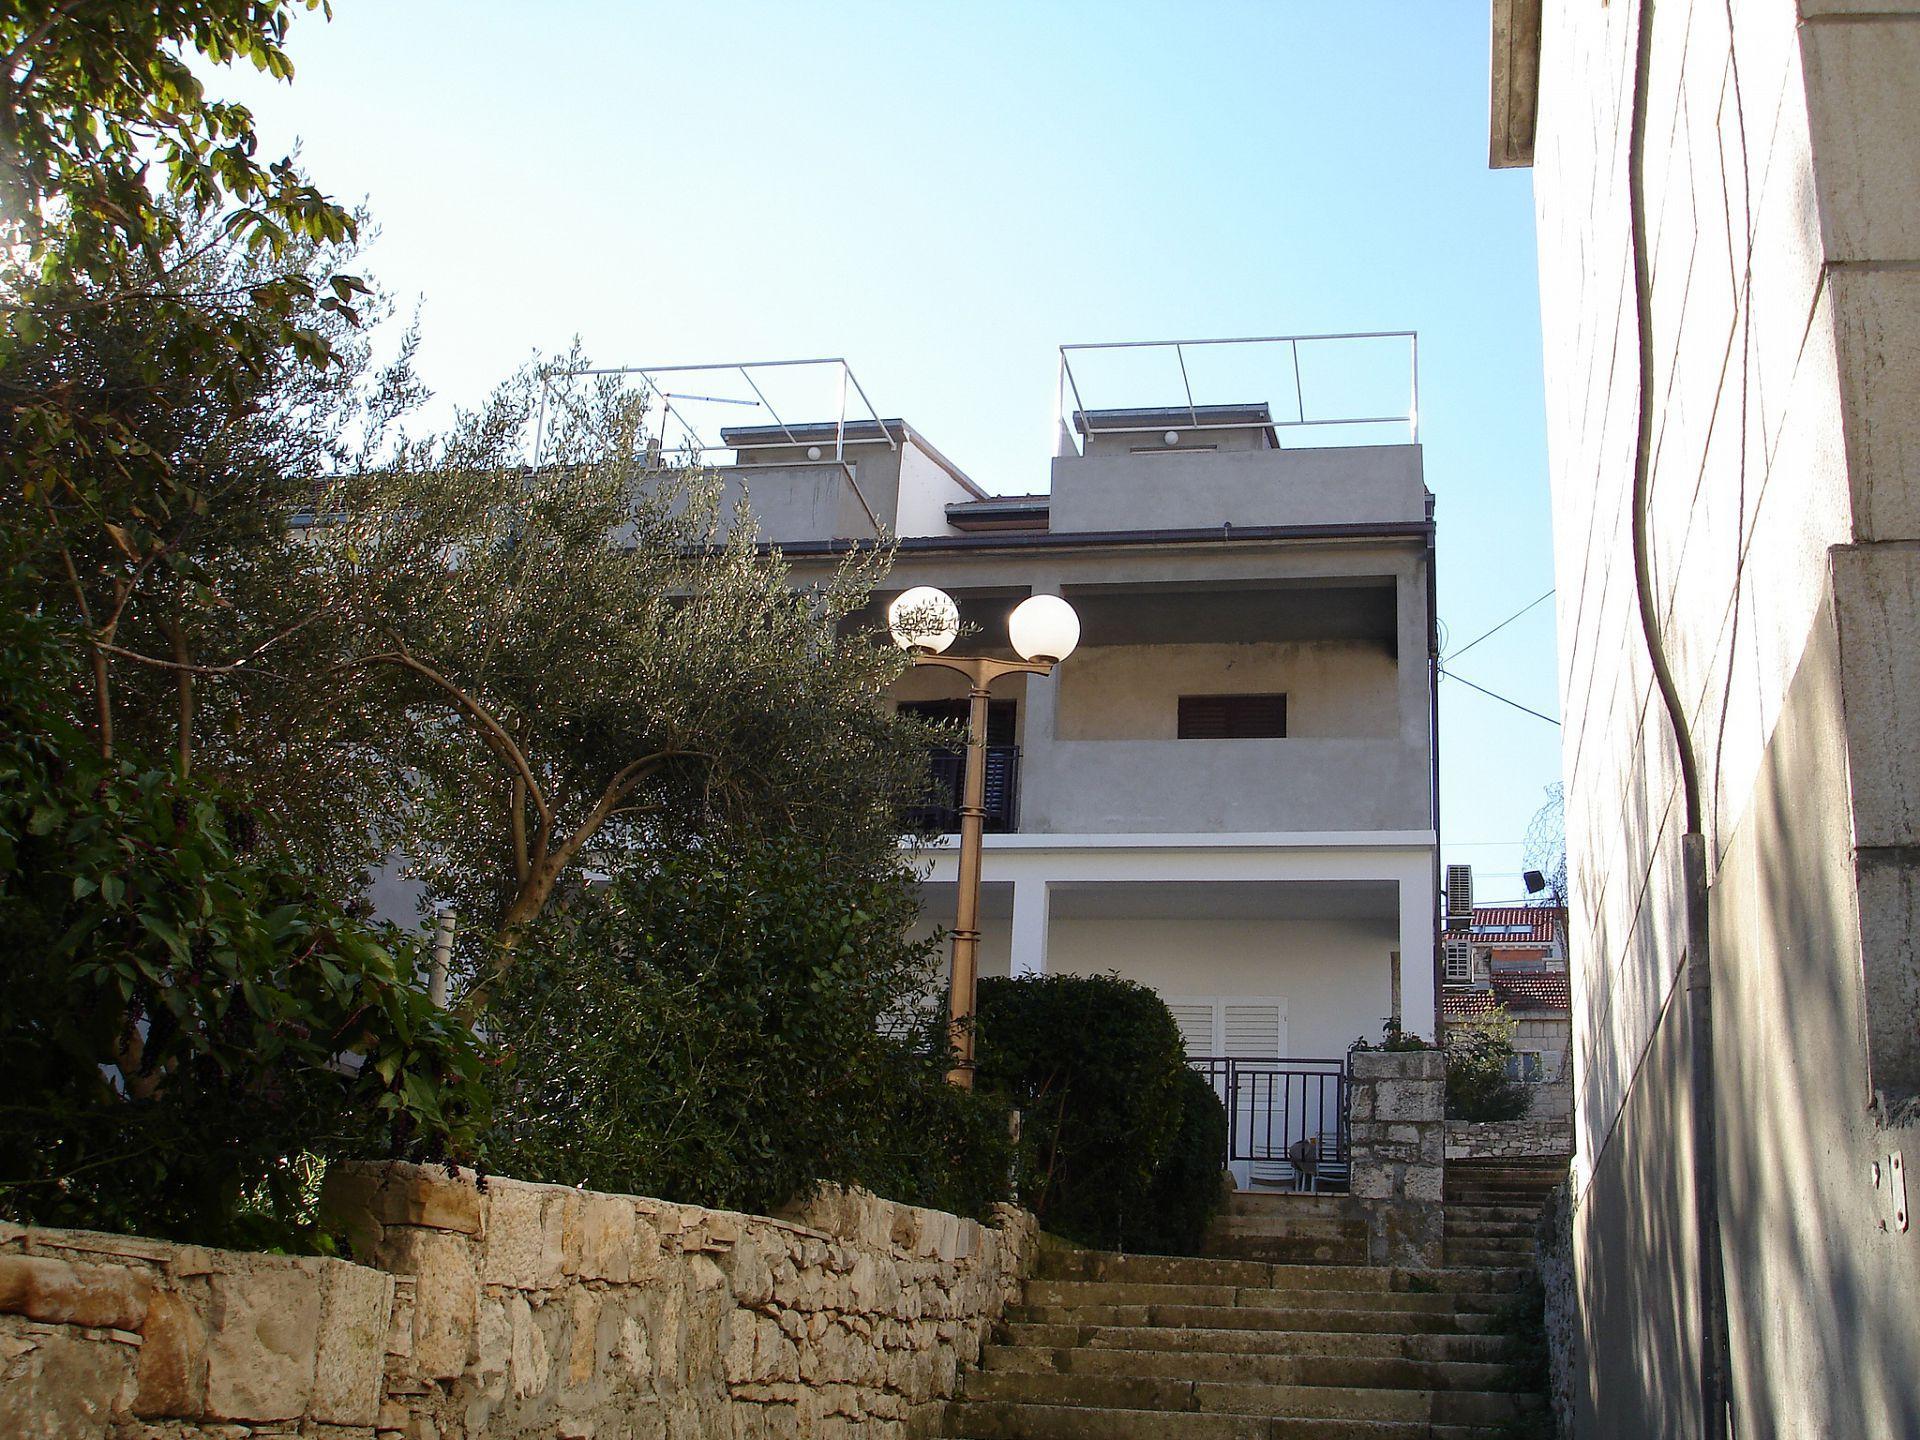 Ferienwohnung Ankica SA1(2) - Korcula (739749), Korčula, Insel Korcula, Dalmatien, Kroatien, Bild 2